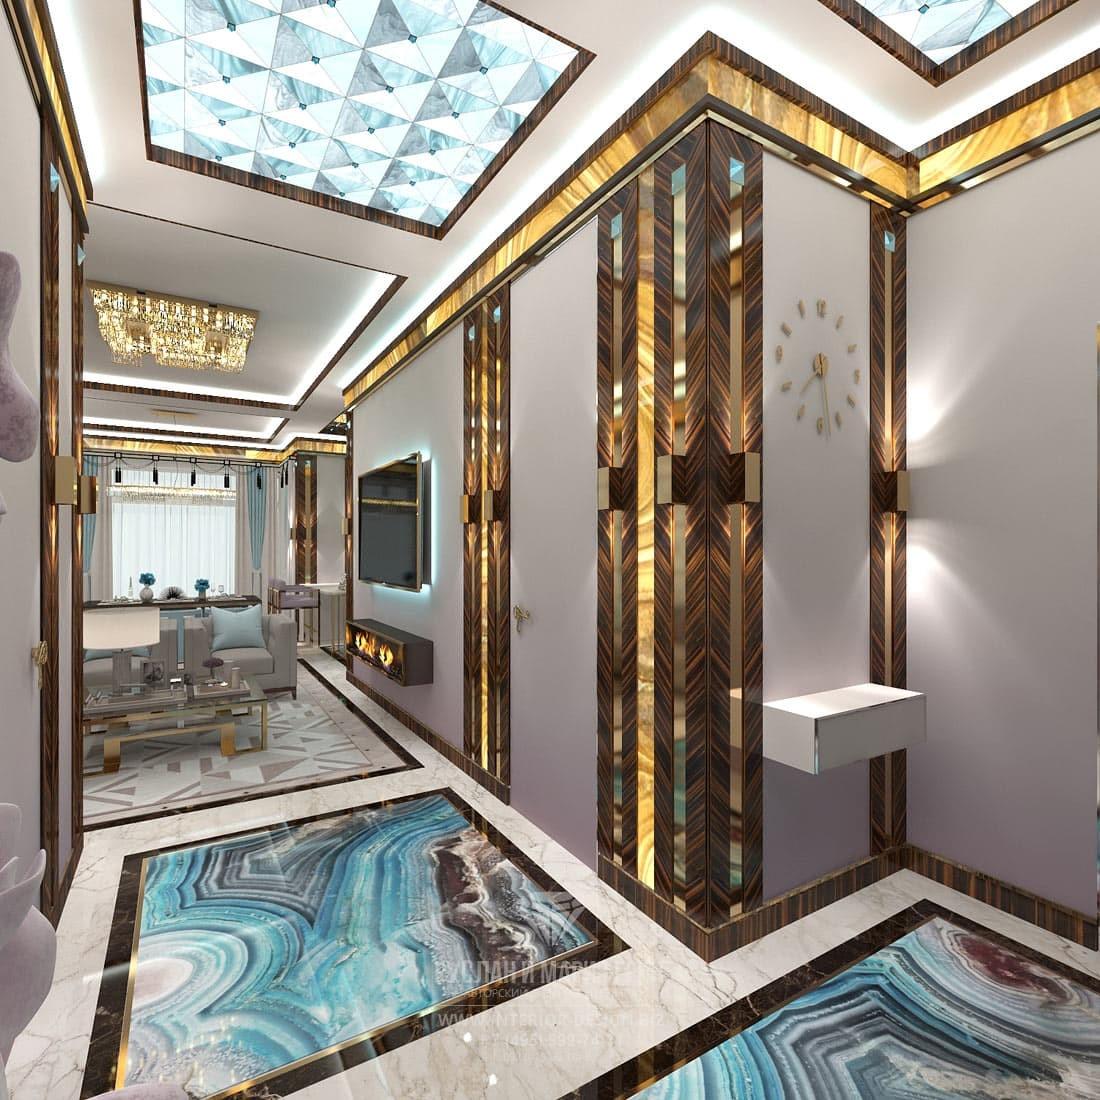 Дизайн холла и коридора с авторскими панелями и полом